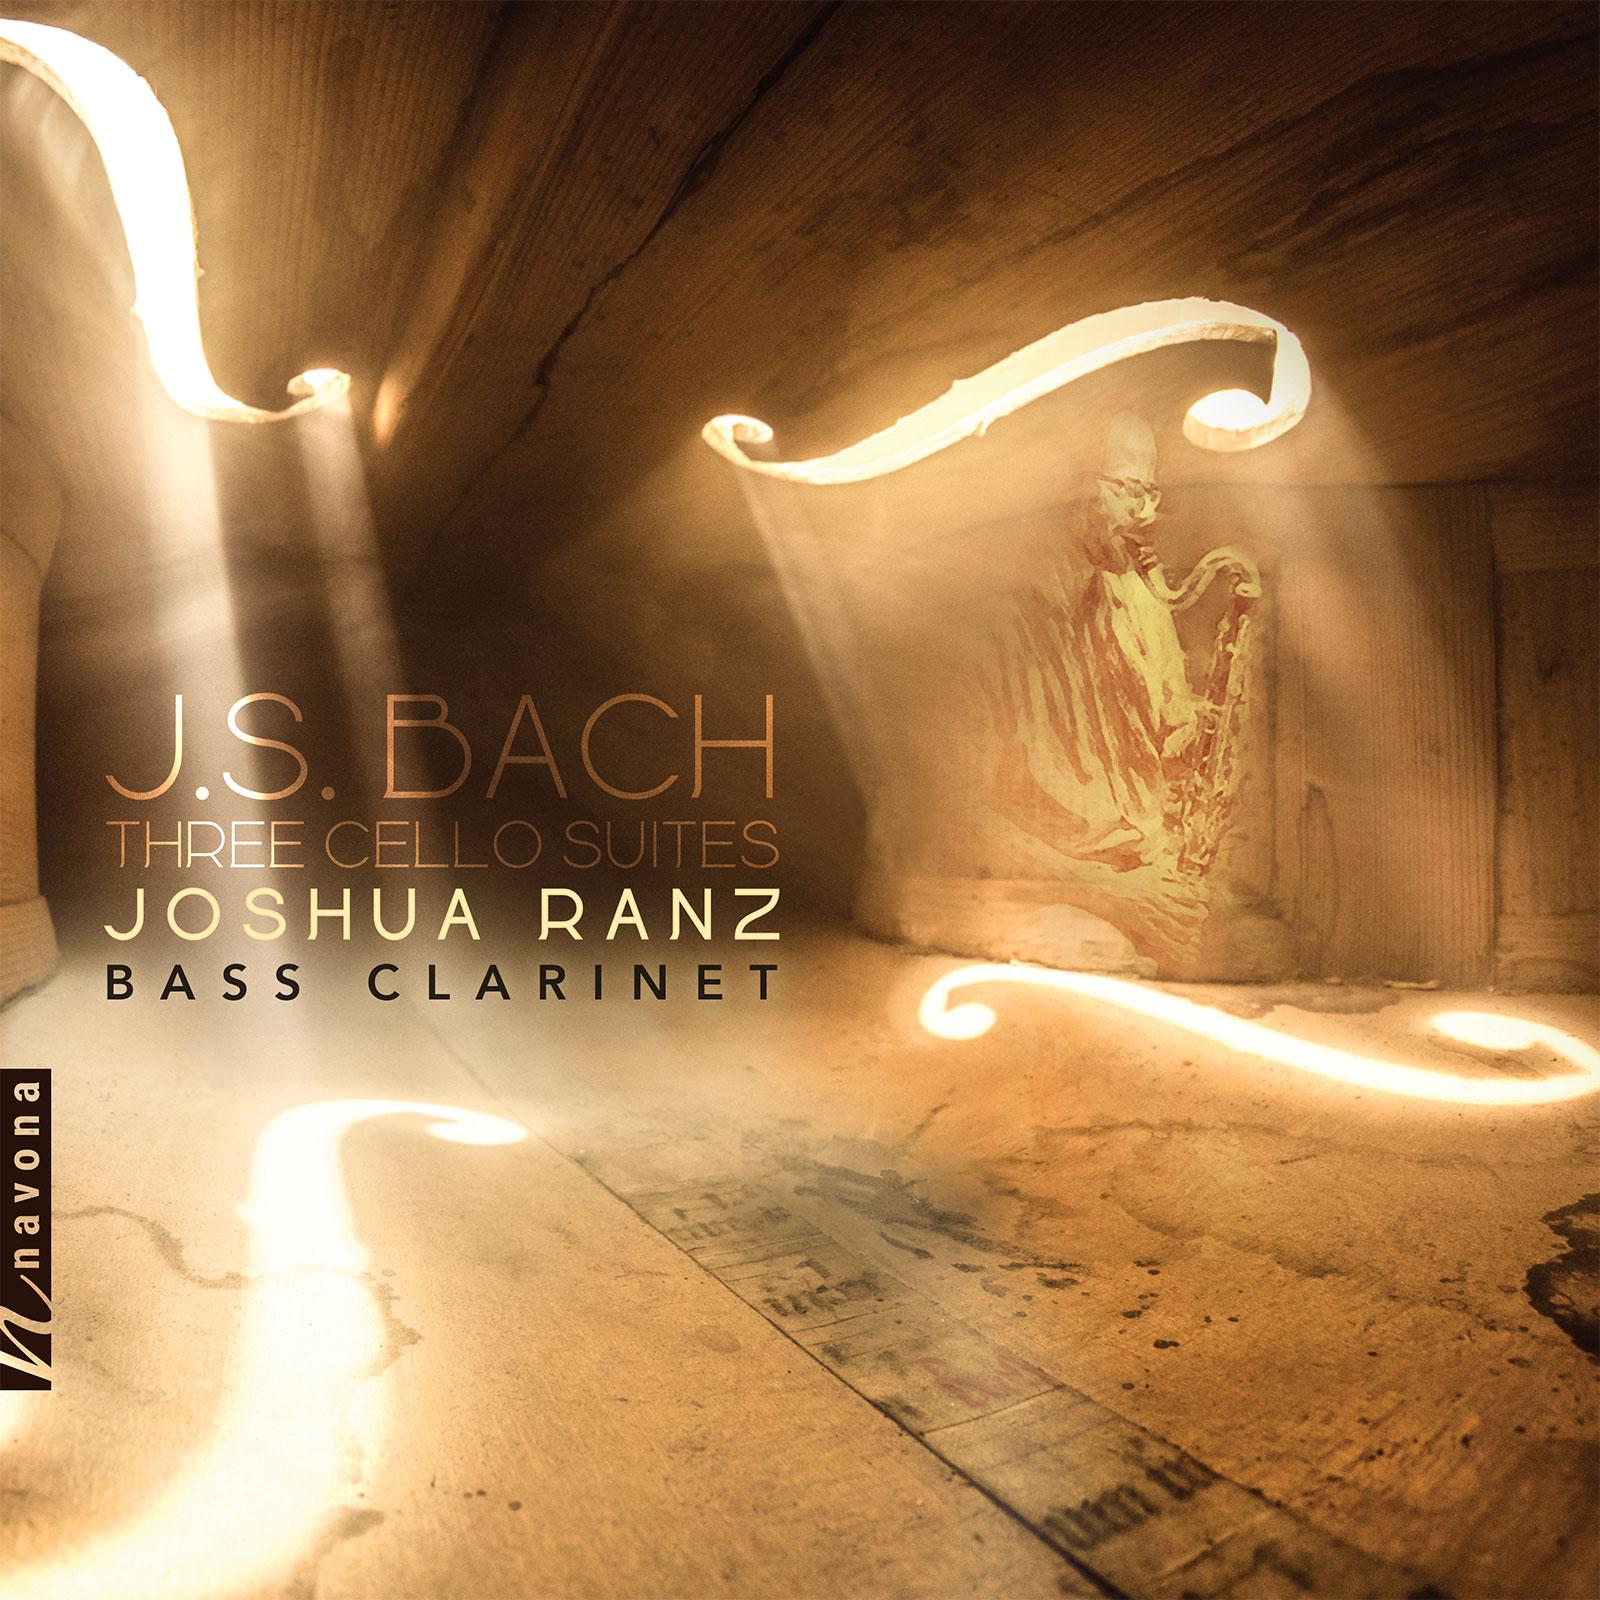 J.S. Bach: Three Cello Suites